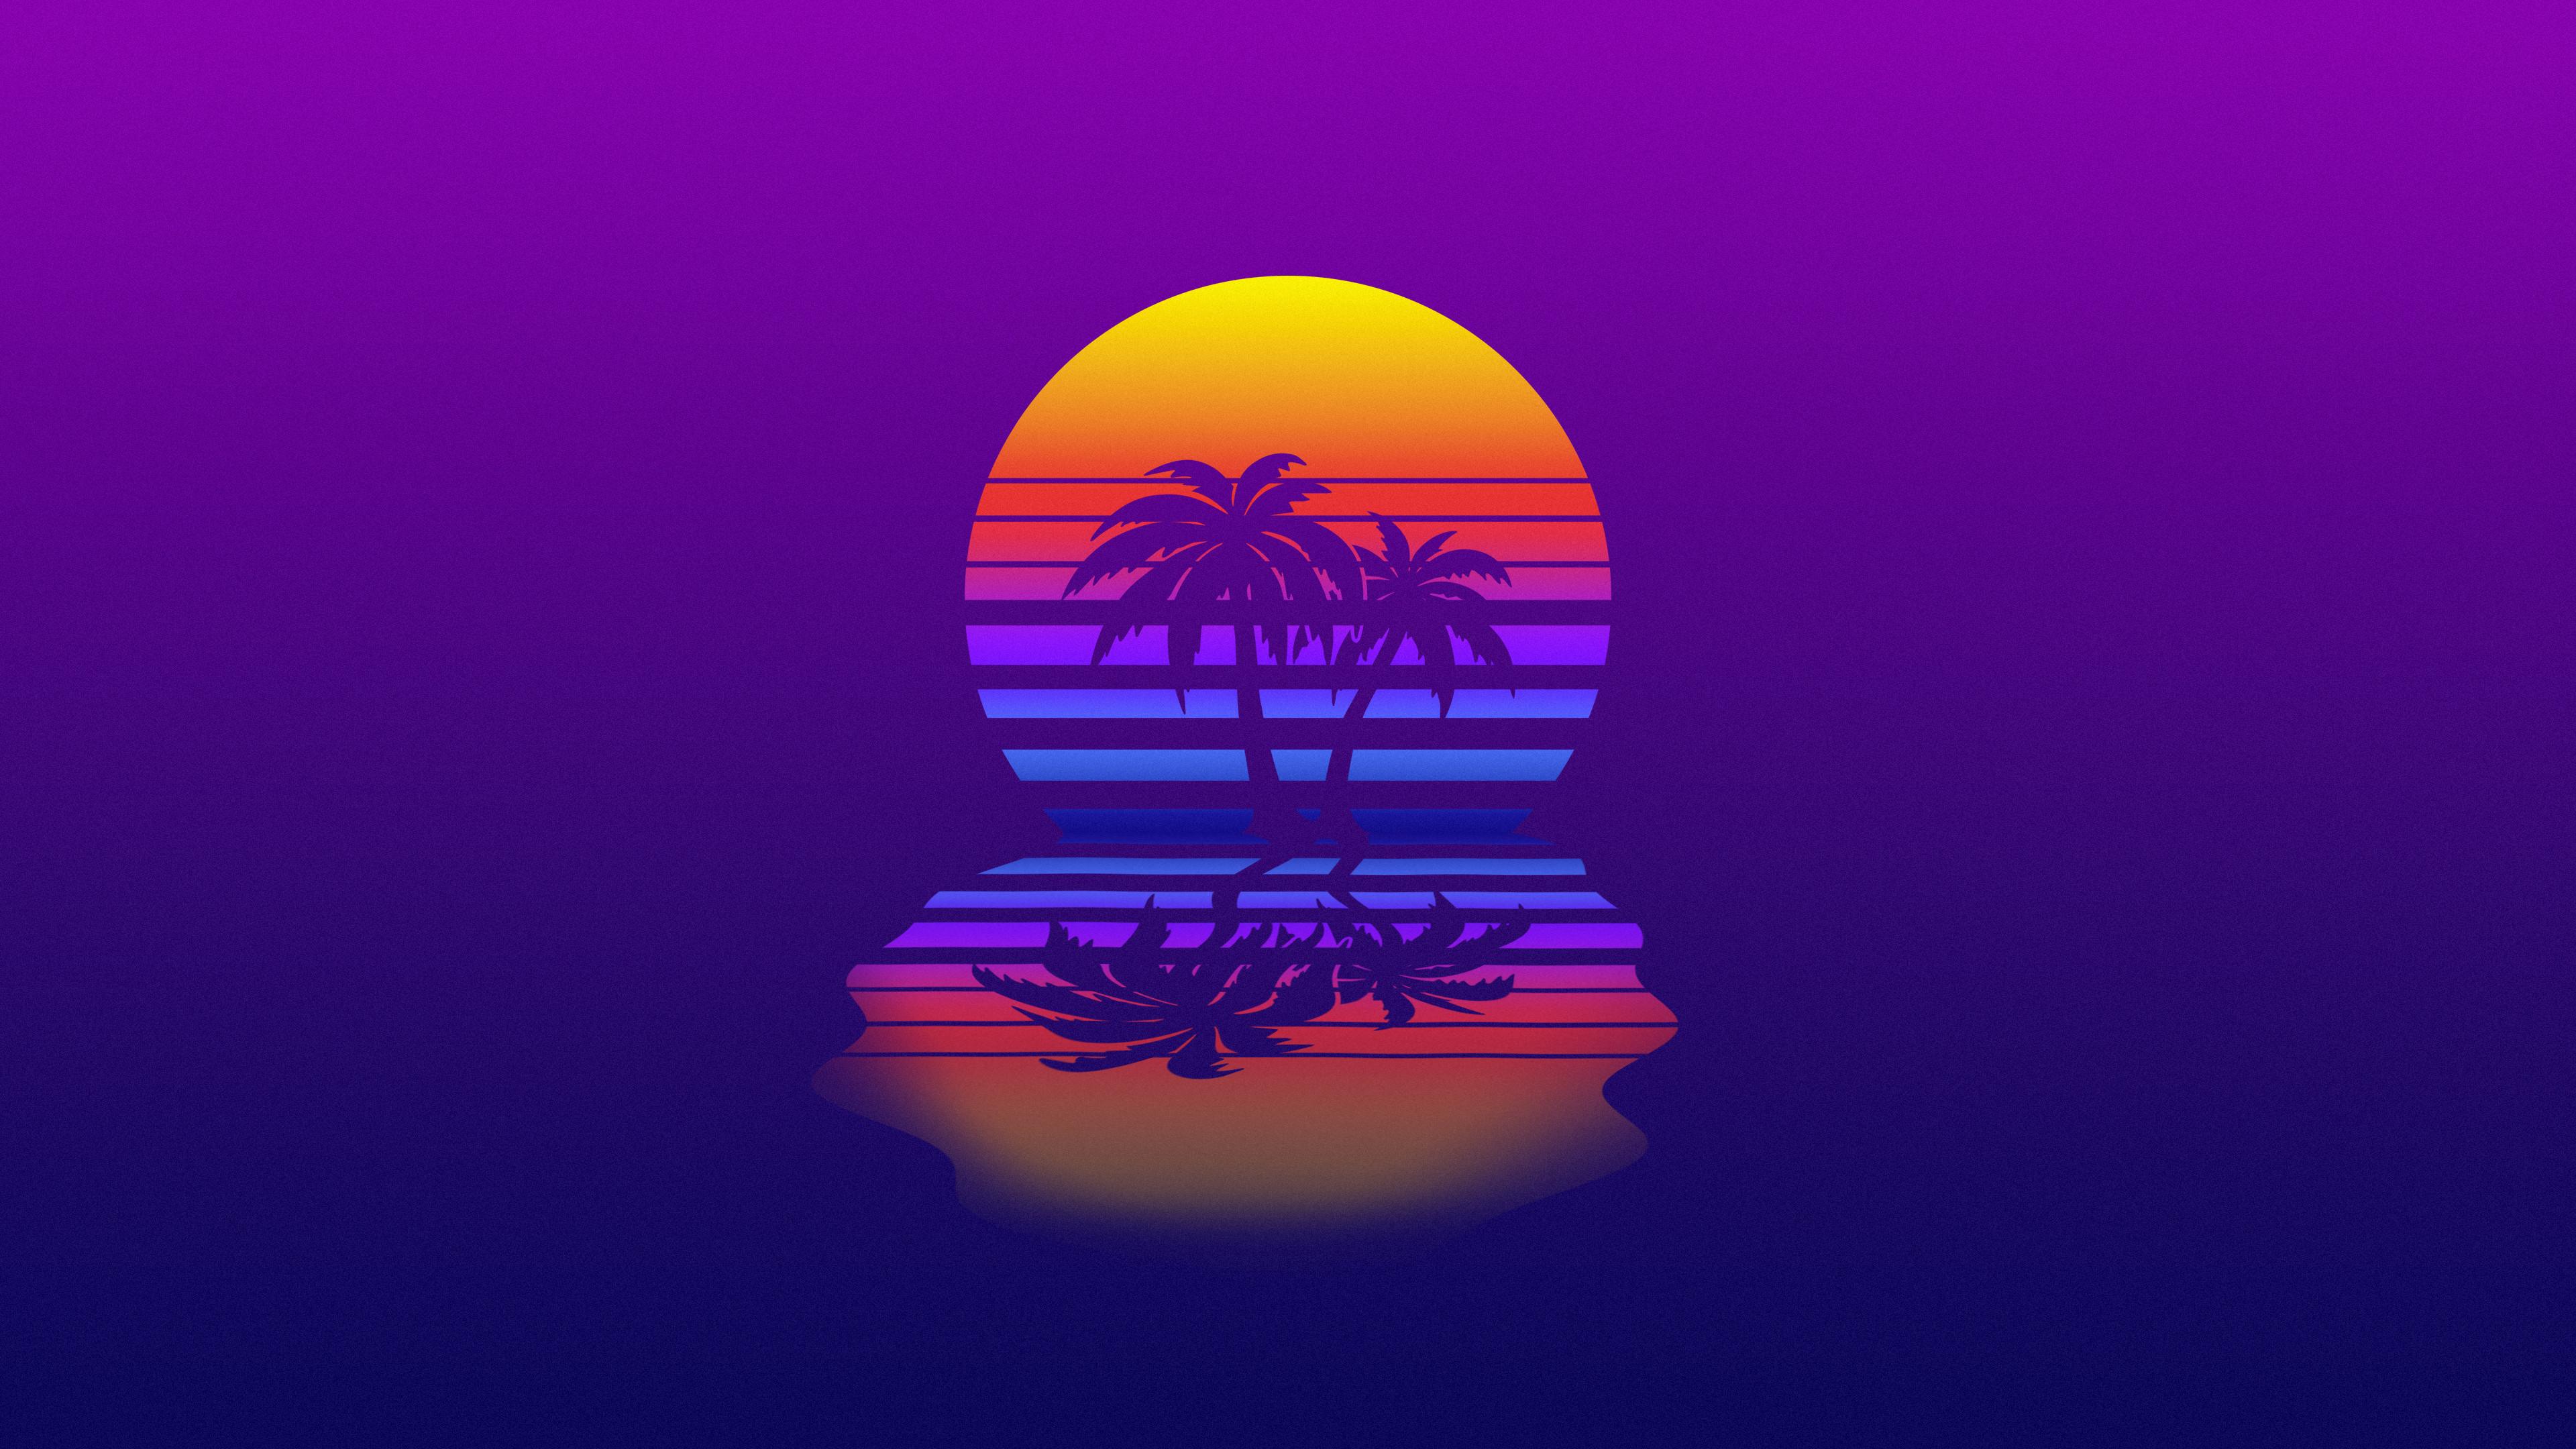 Palm Tree Synthwave Retrowave Digital Art 4K Wallpaper 76 3840x2160